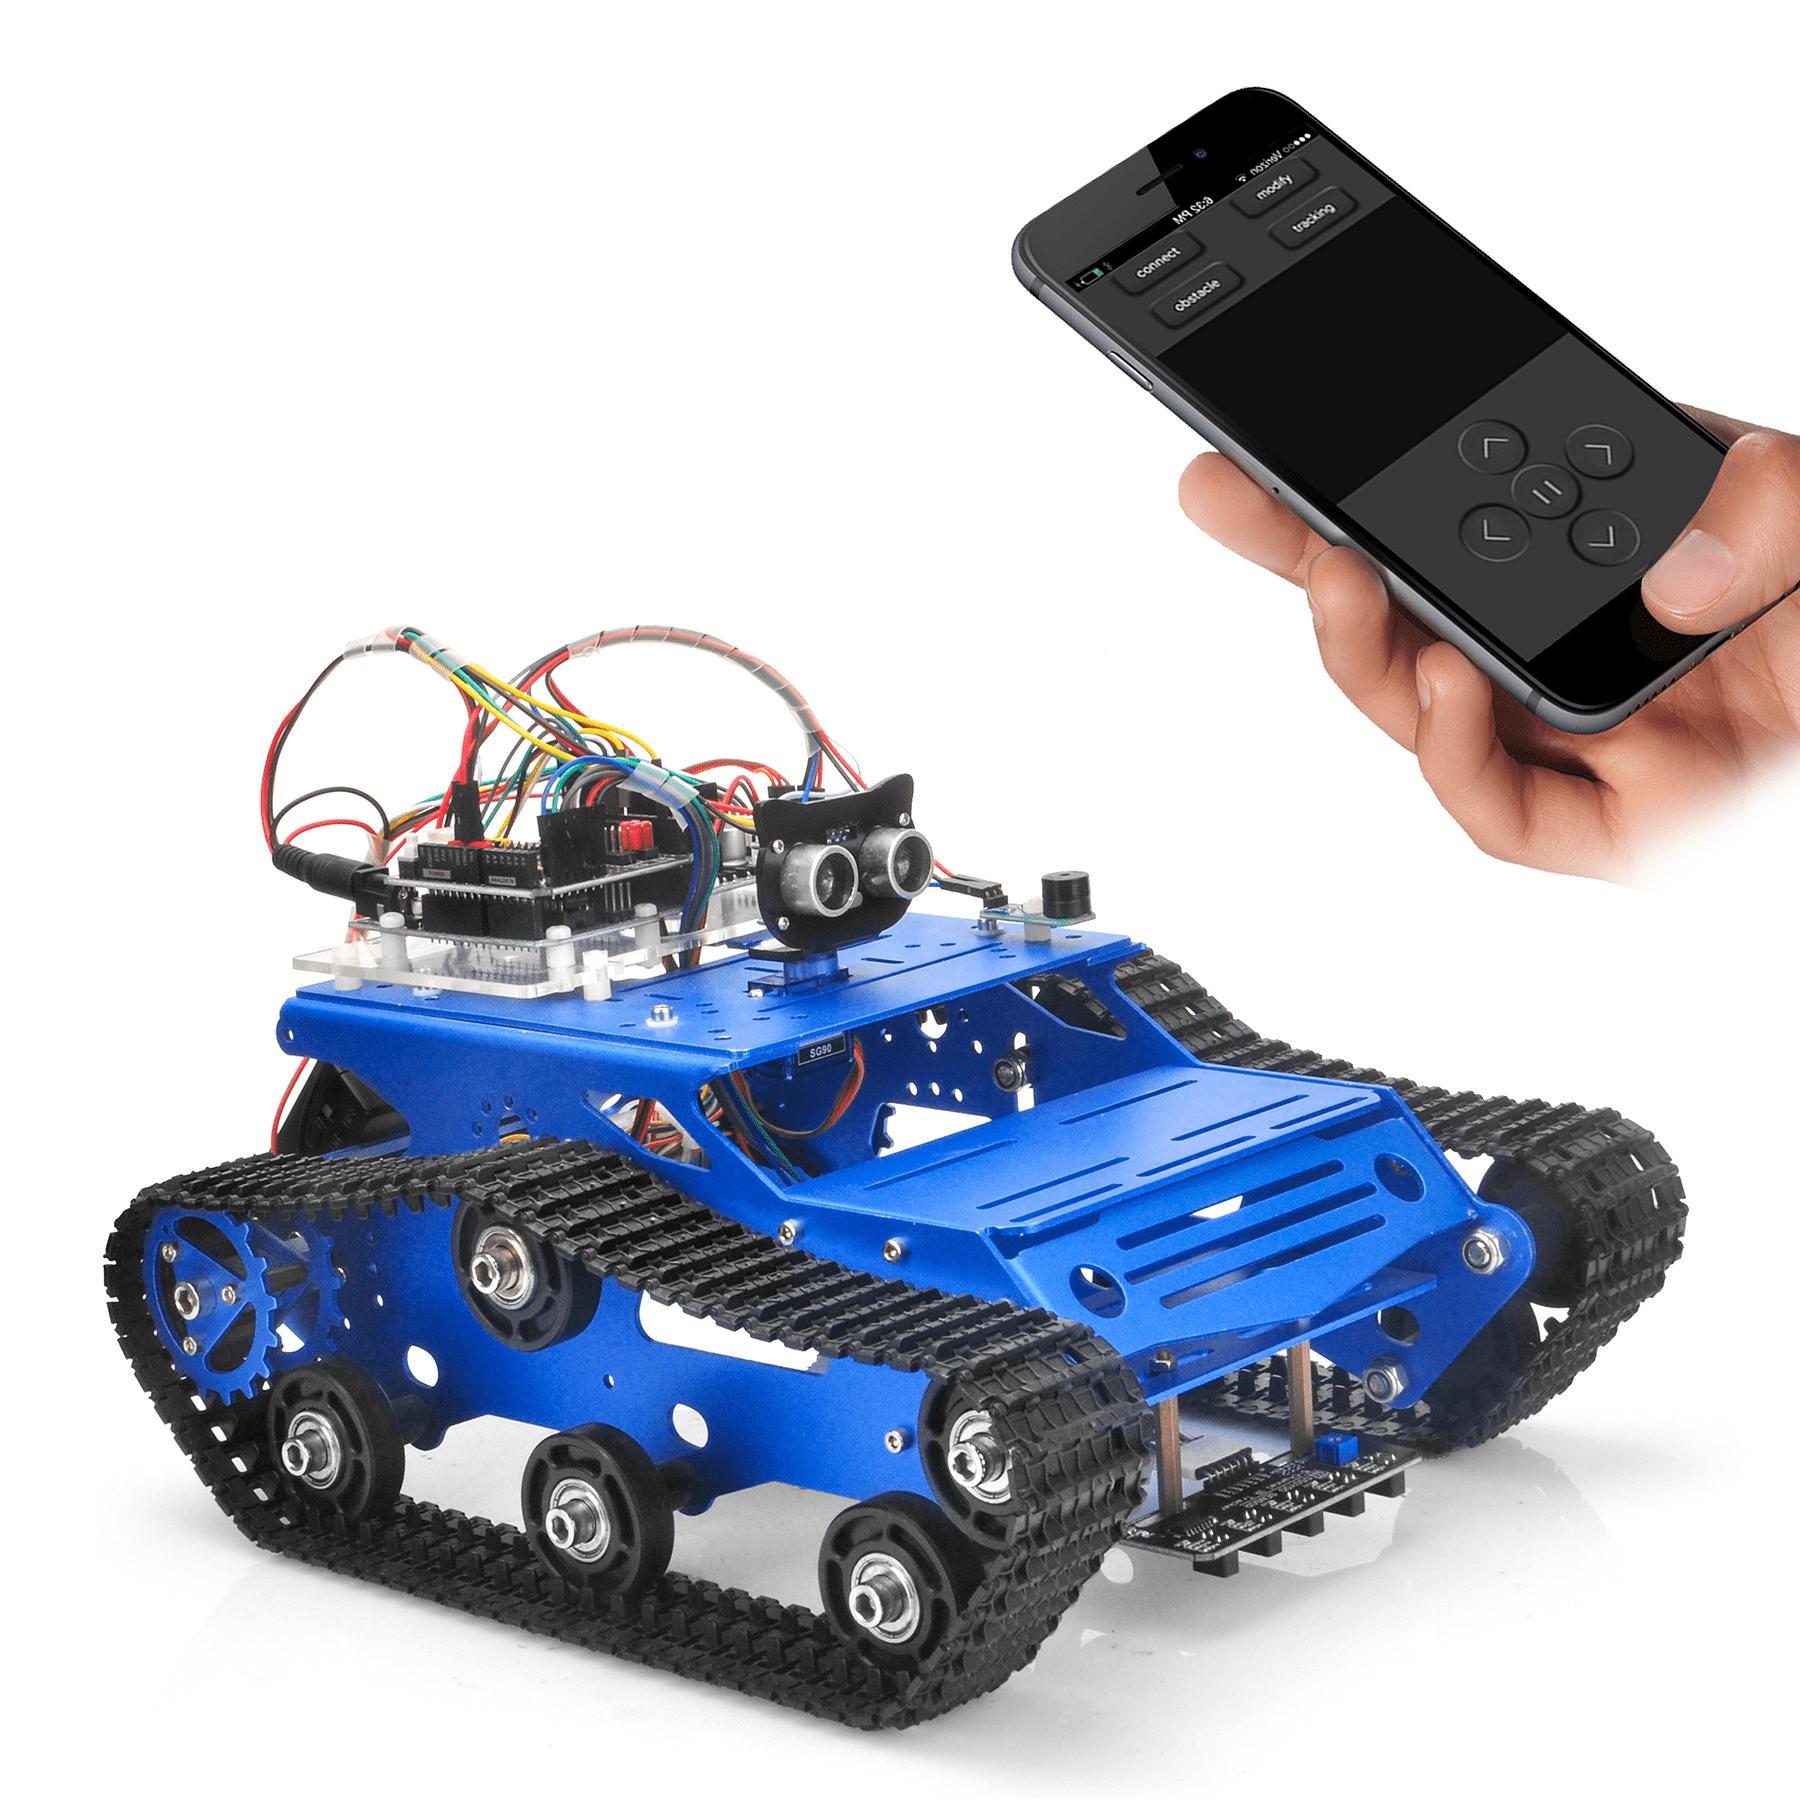 Robot Tank Car Kit V2. 0 Lesson6: WiFi IoT controlled